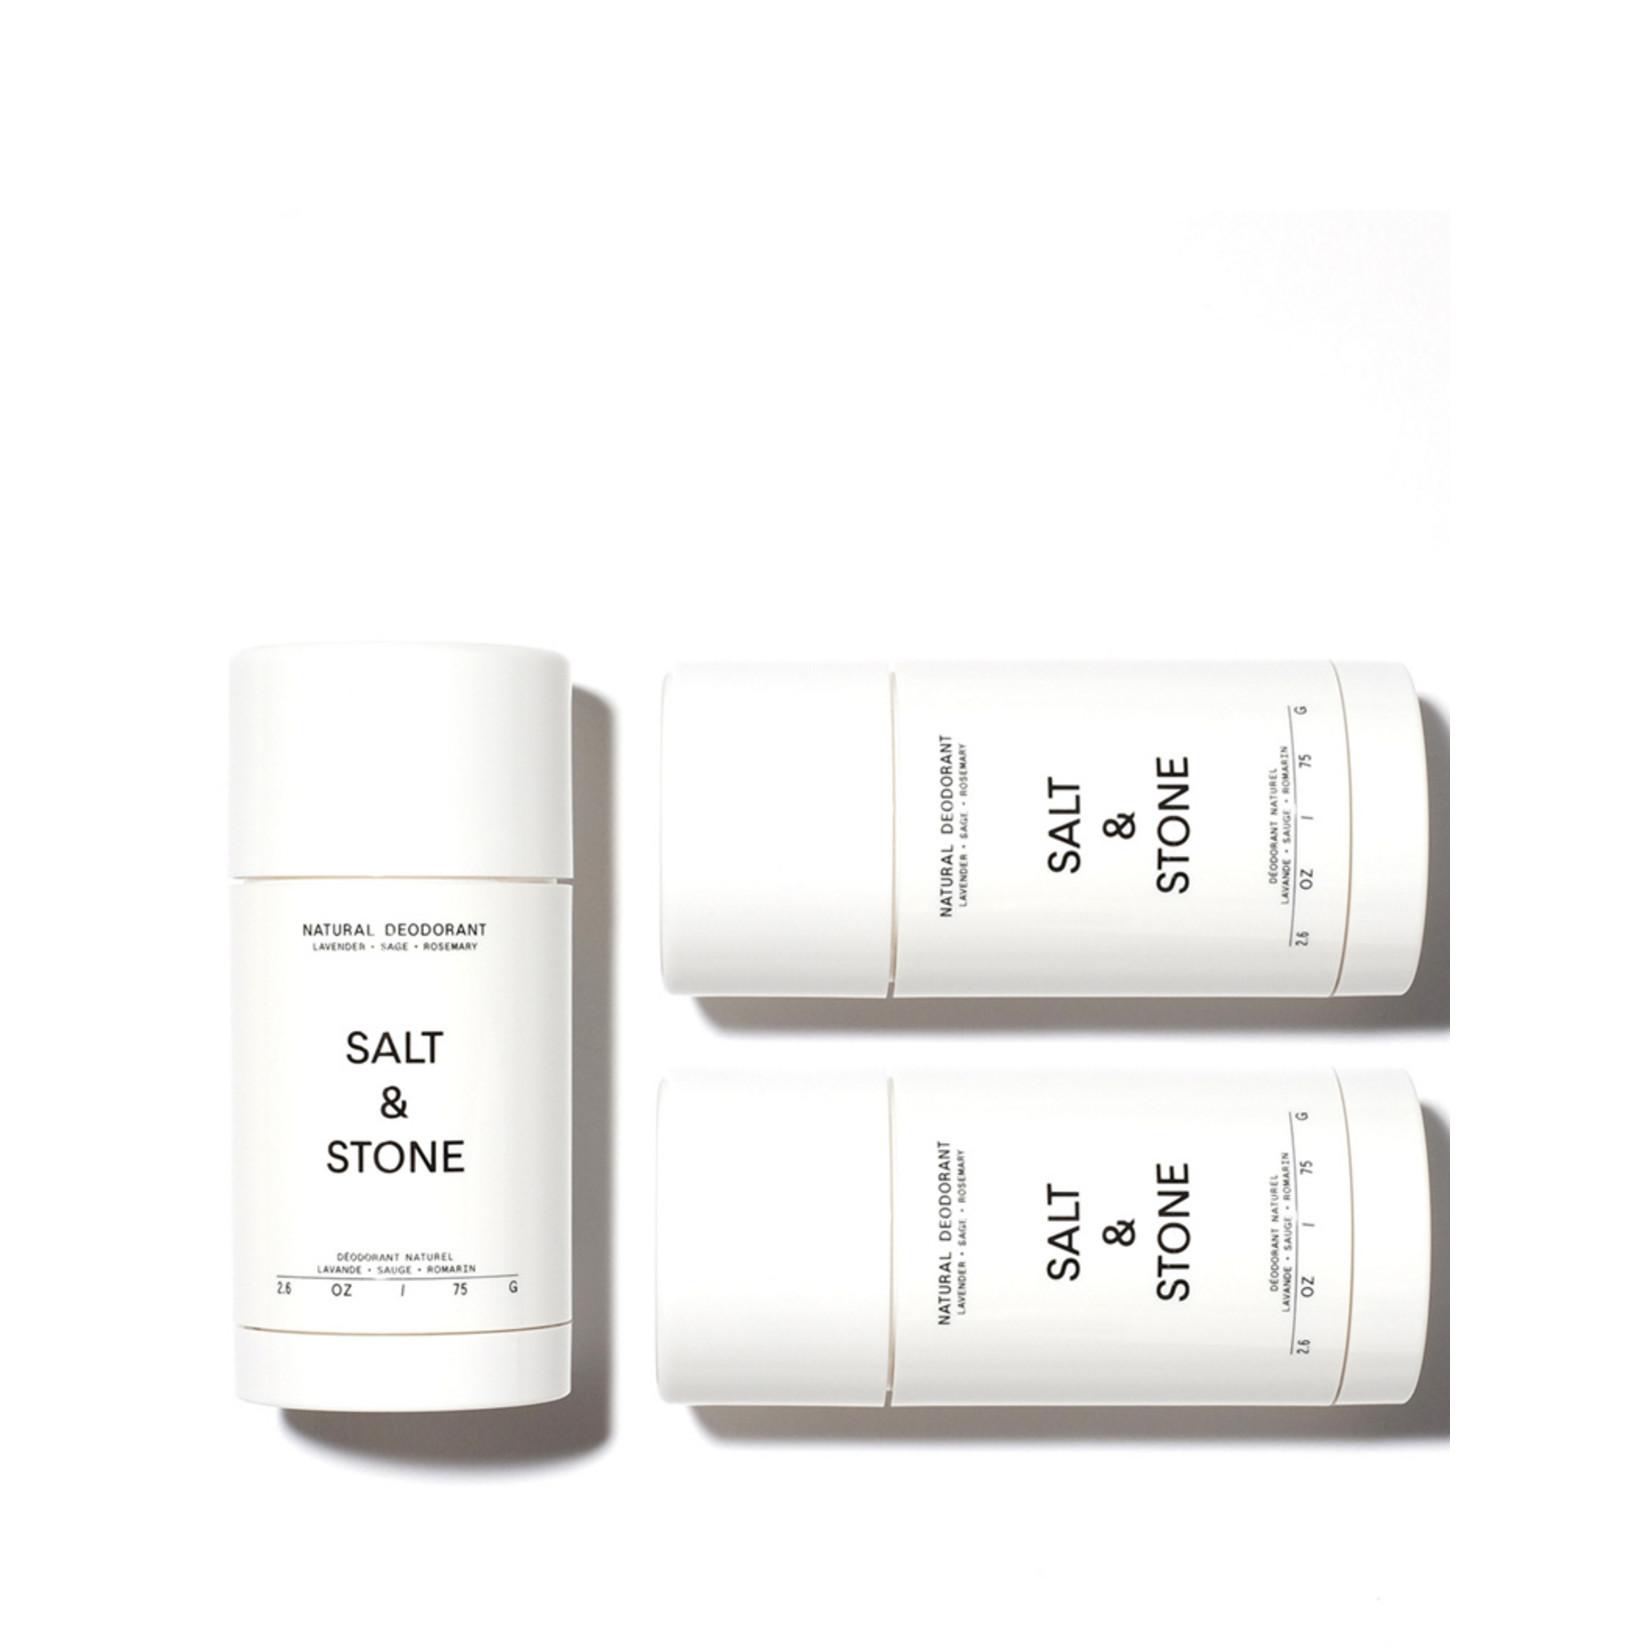 SALT & STONE DEODORANT LAVENDER & SAGE -  NATURAL DEODORANT